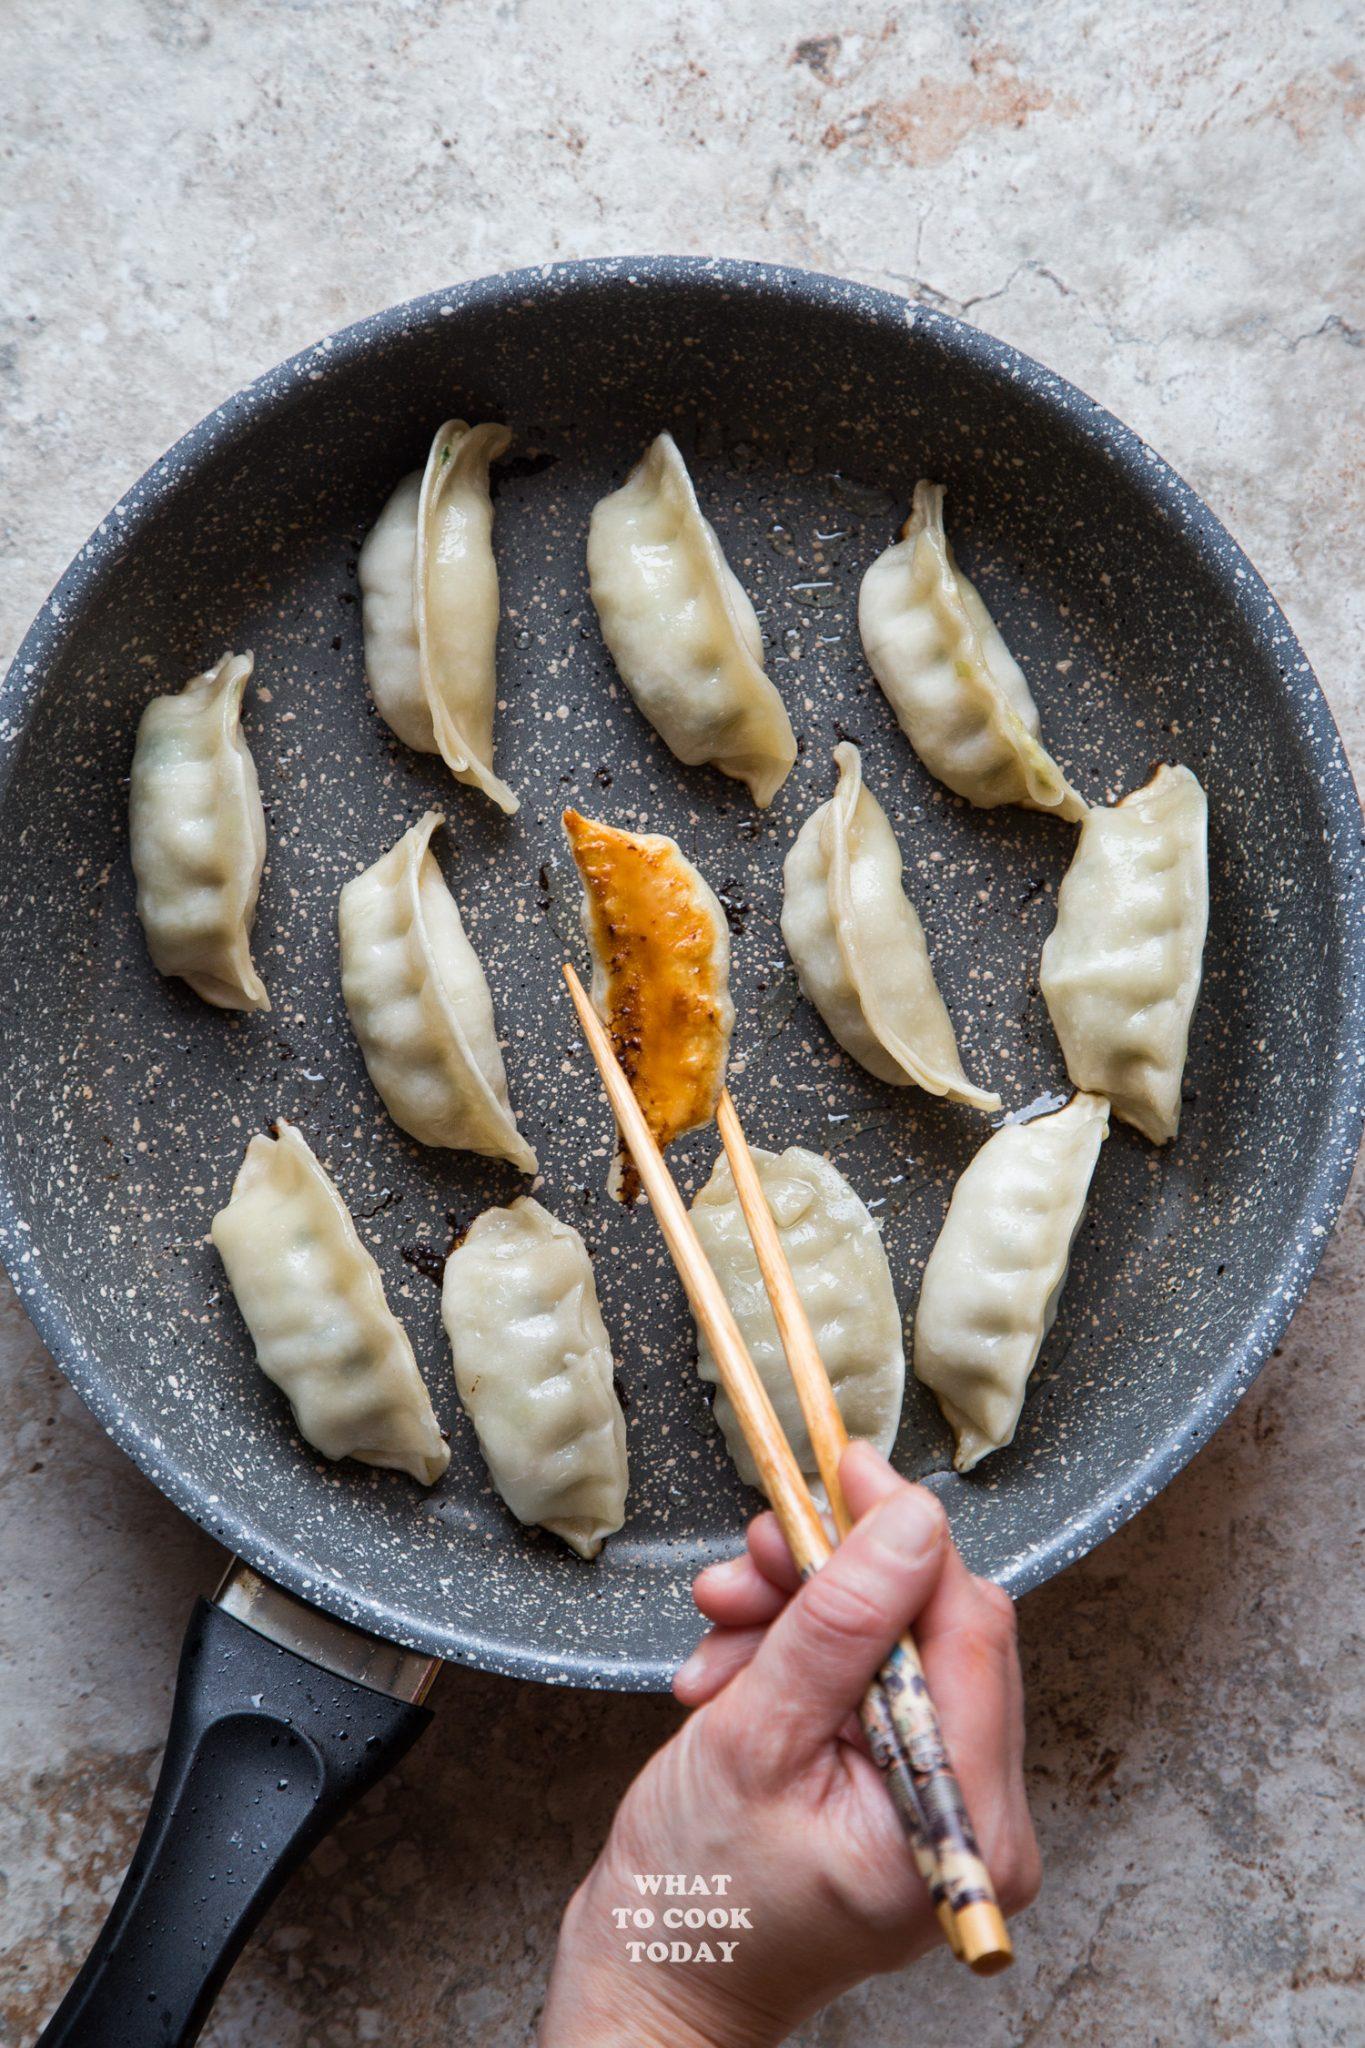 Ling Ling Pot Stickers #ad #LingLingAsianFood #LL #asianfood #chopsticks #easymeals #potstickers #friedrice